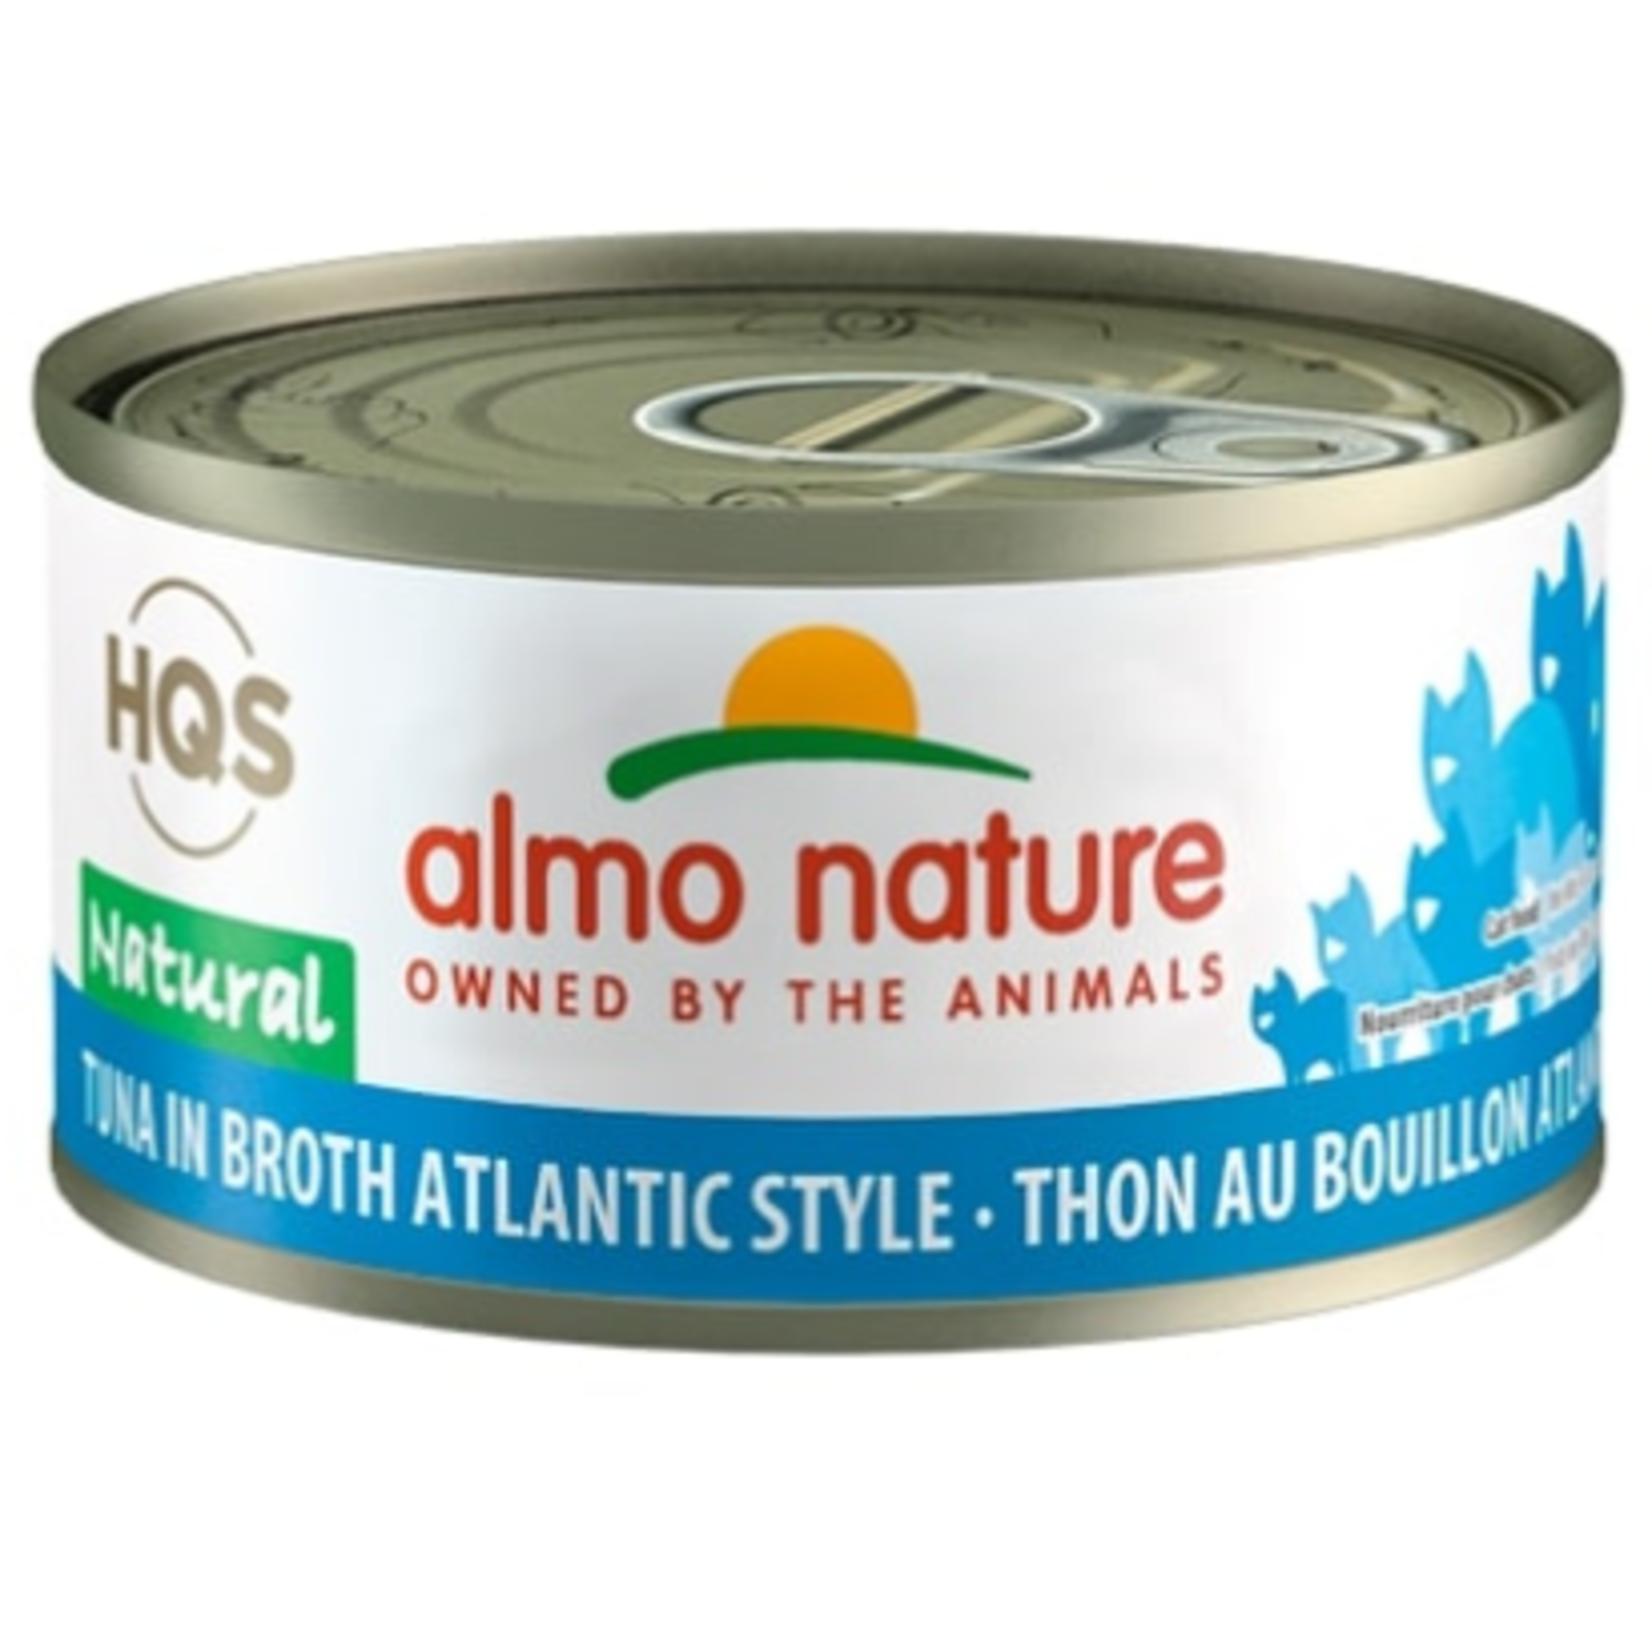 Almo HQS Natural-Tuna in Broth Atlantic Style-70g